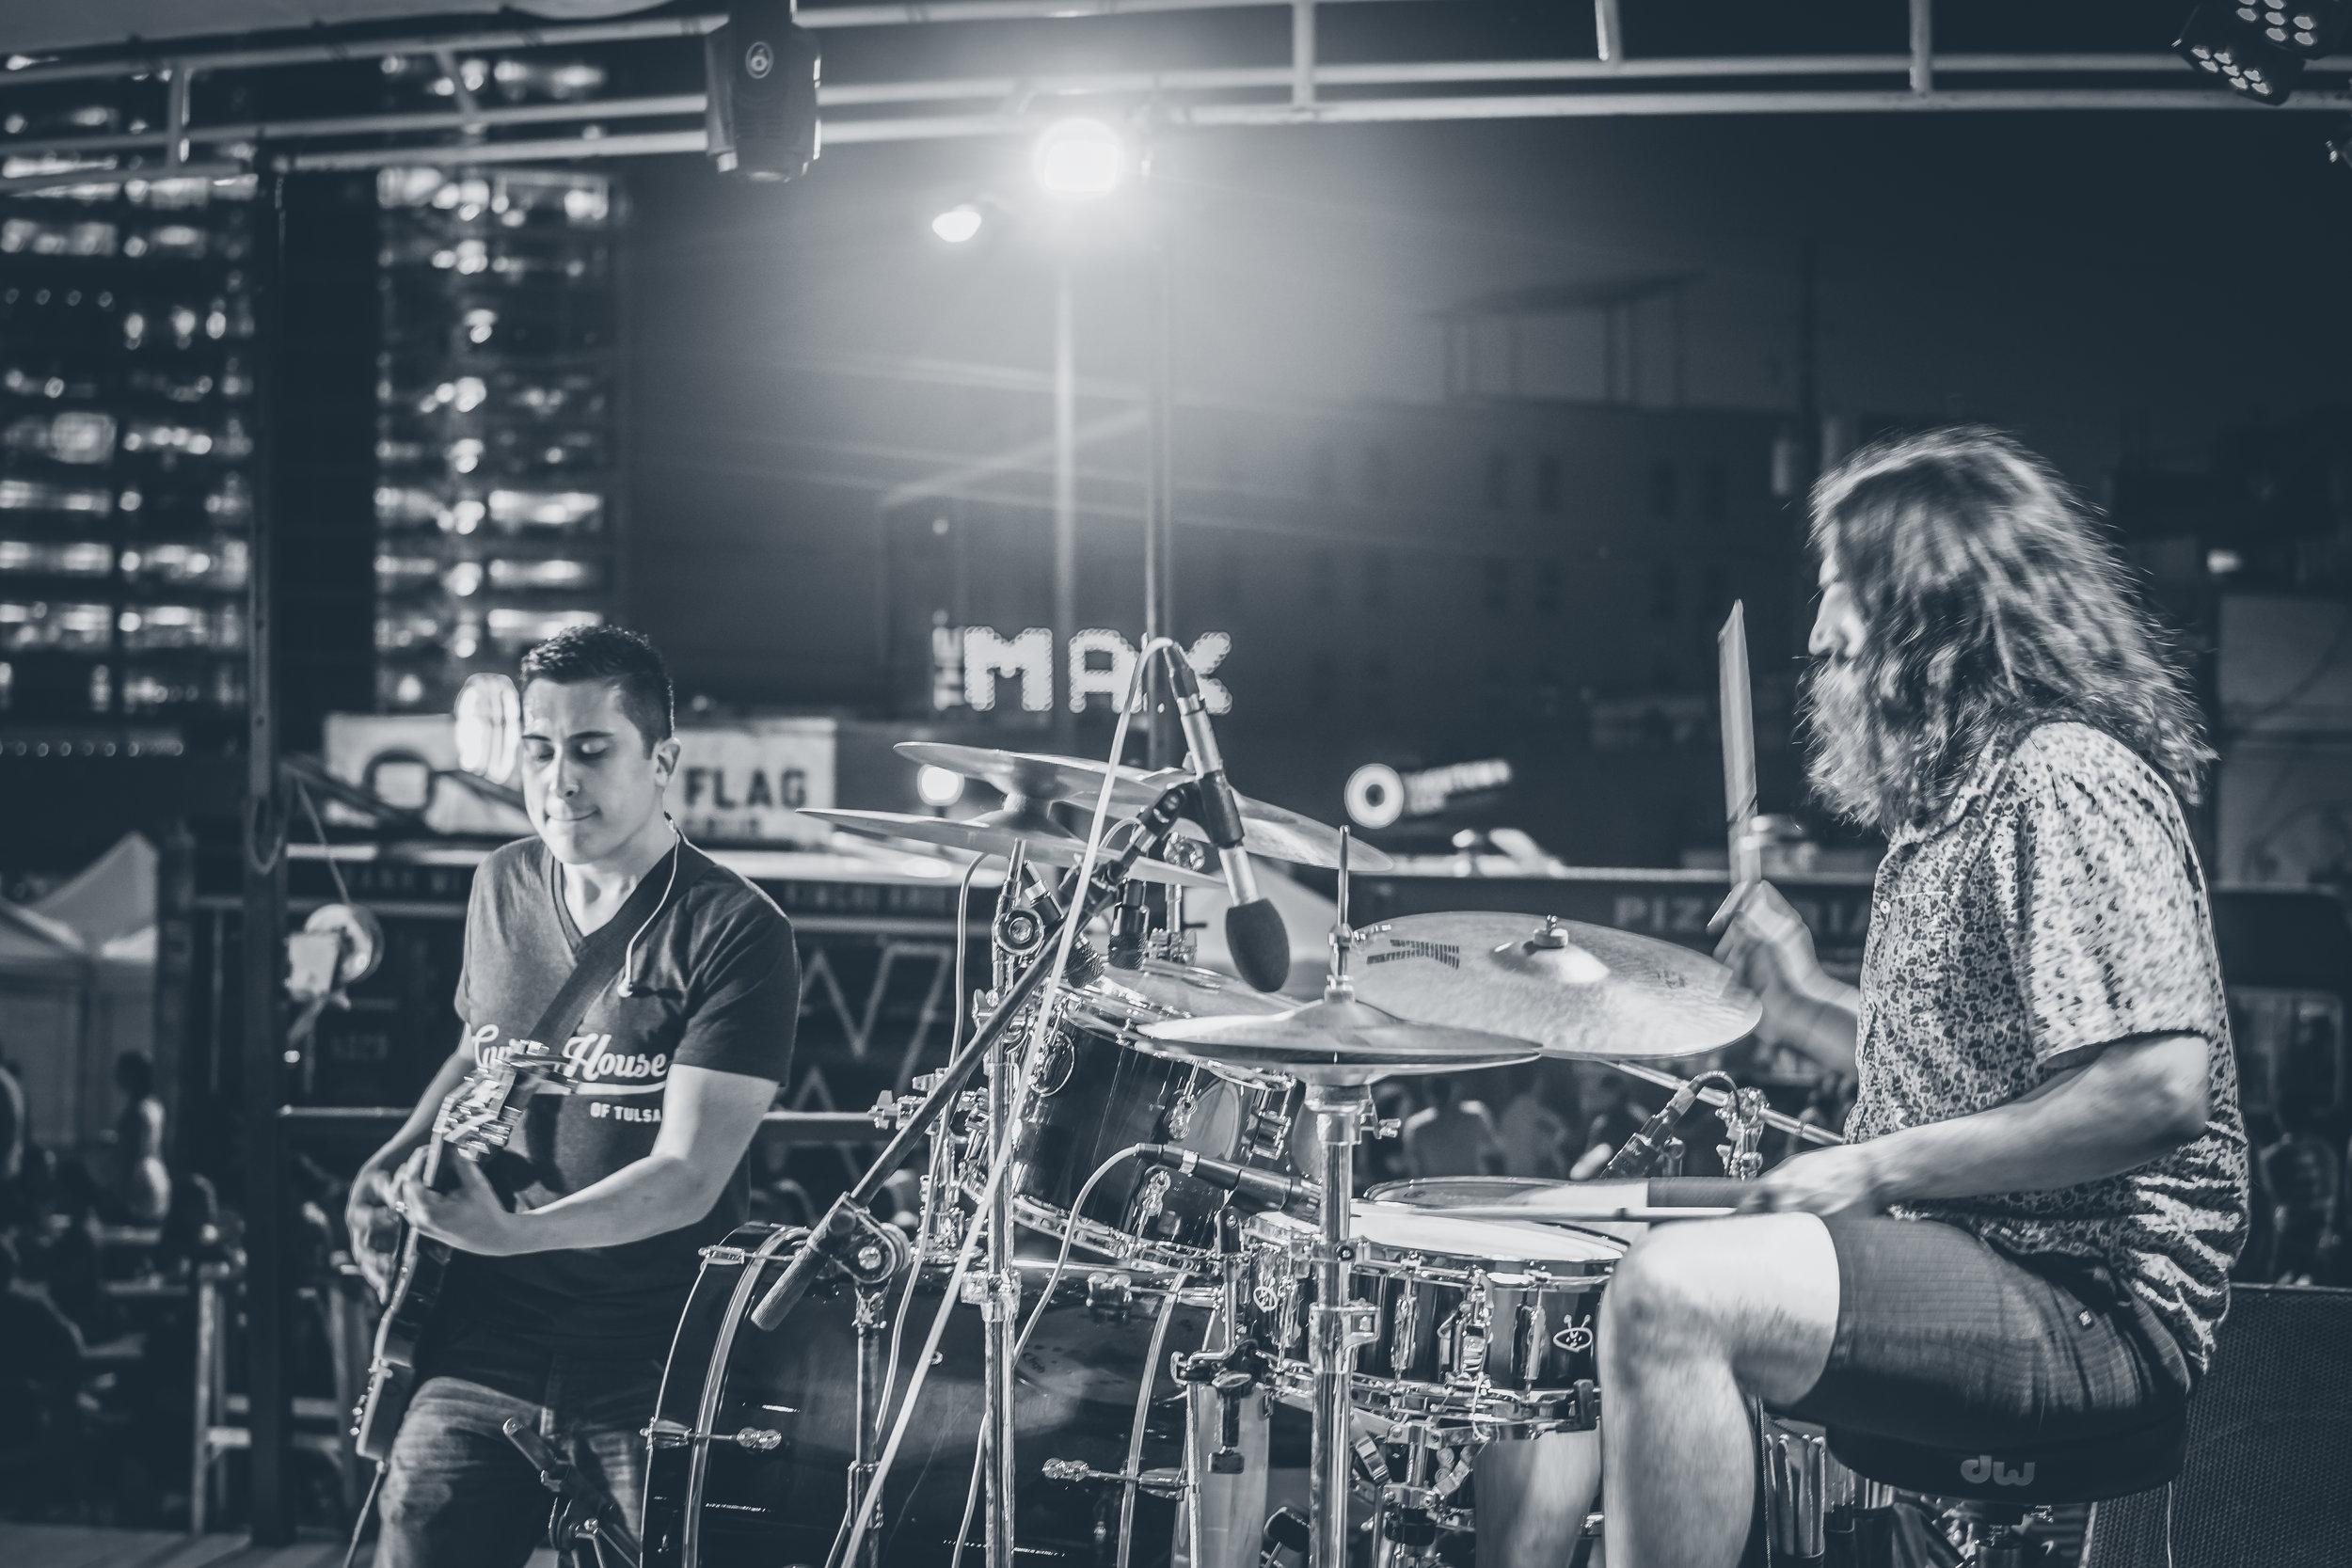 FM Pilots - Blue Dome Arts Festival - Tulsa, OK 052116-8.jpg